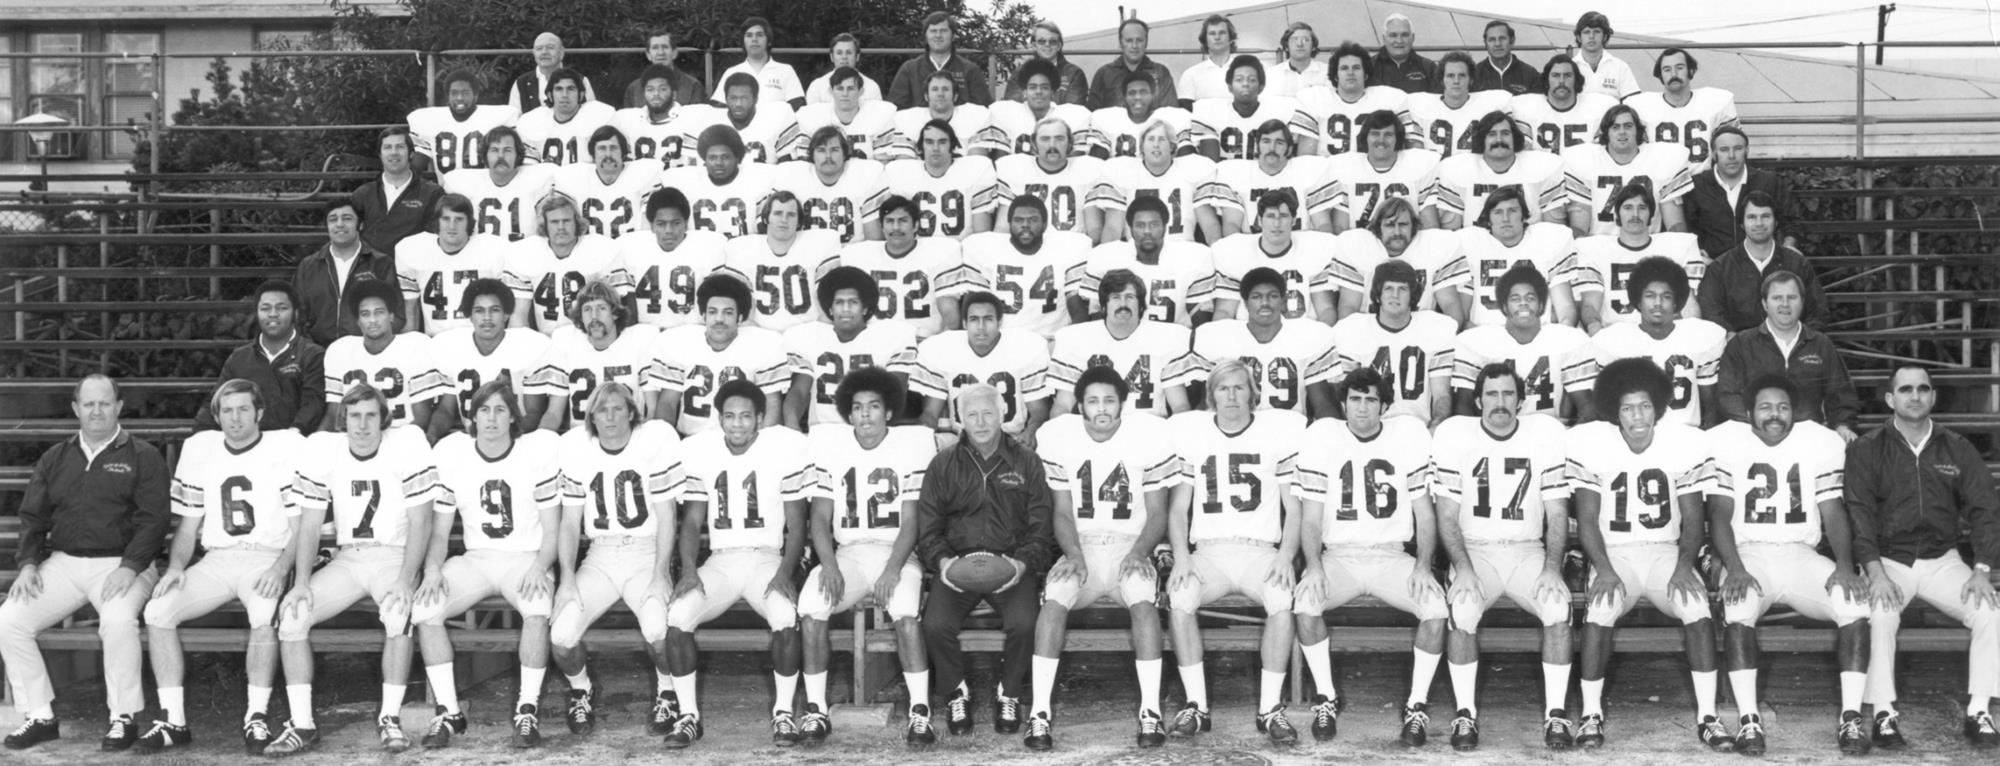 1972 USC team